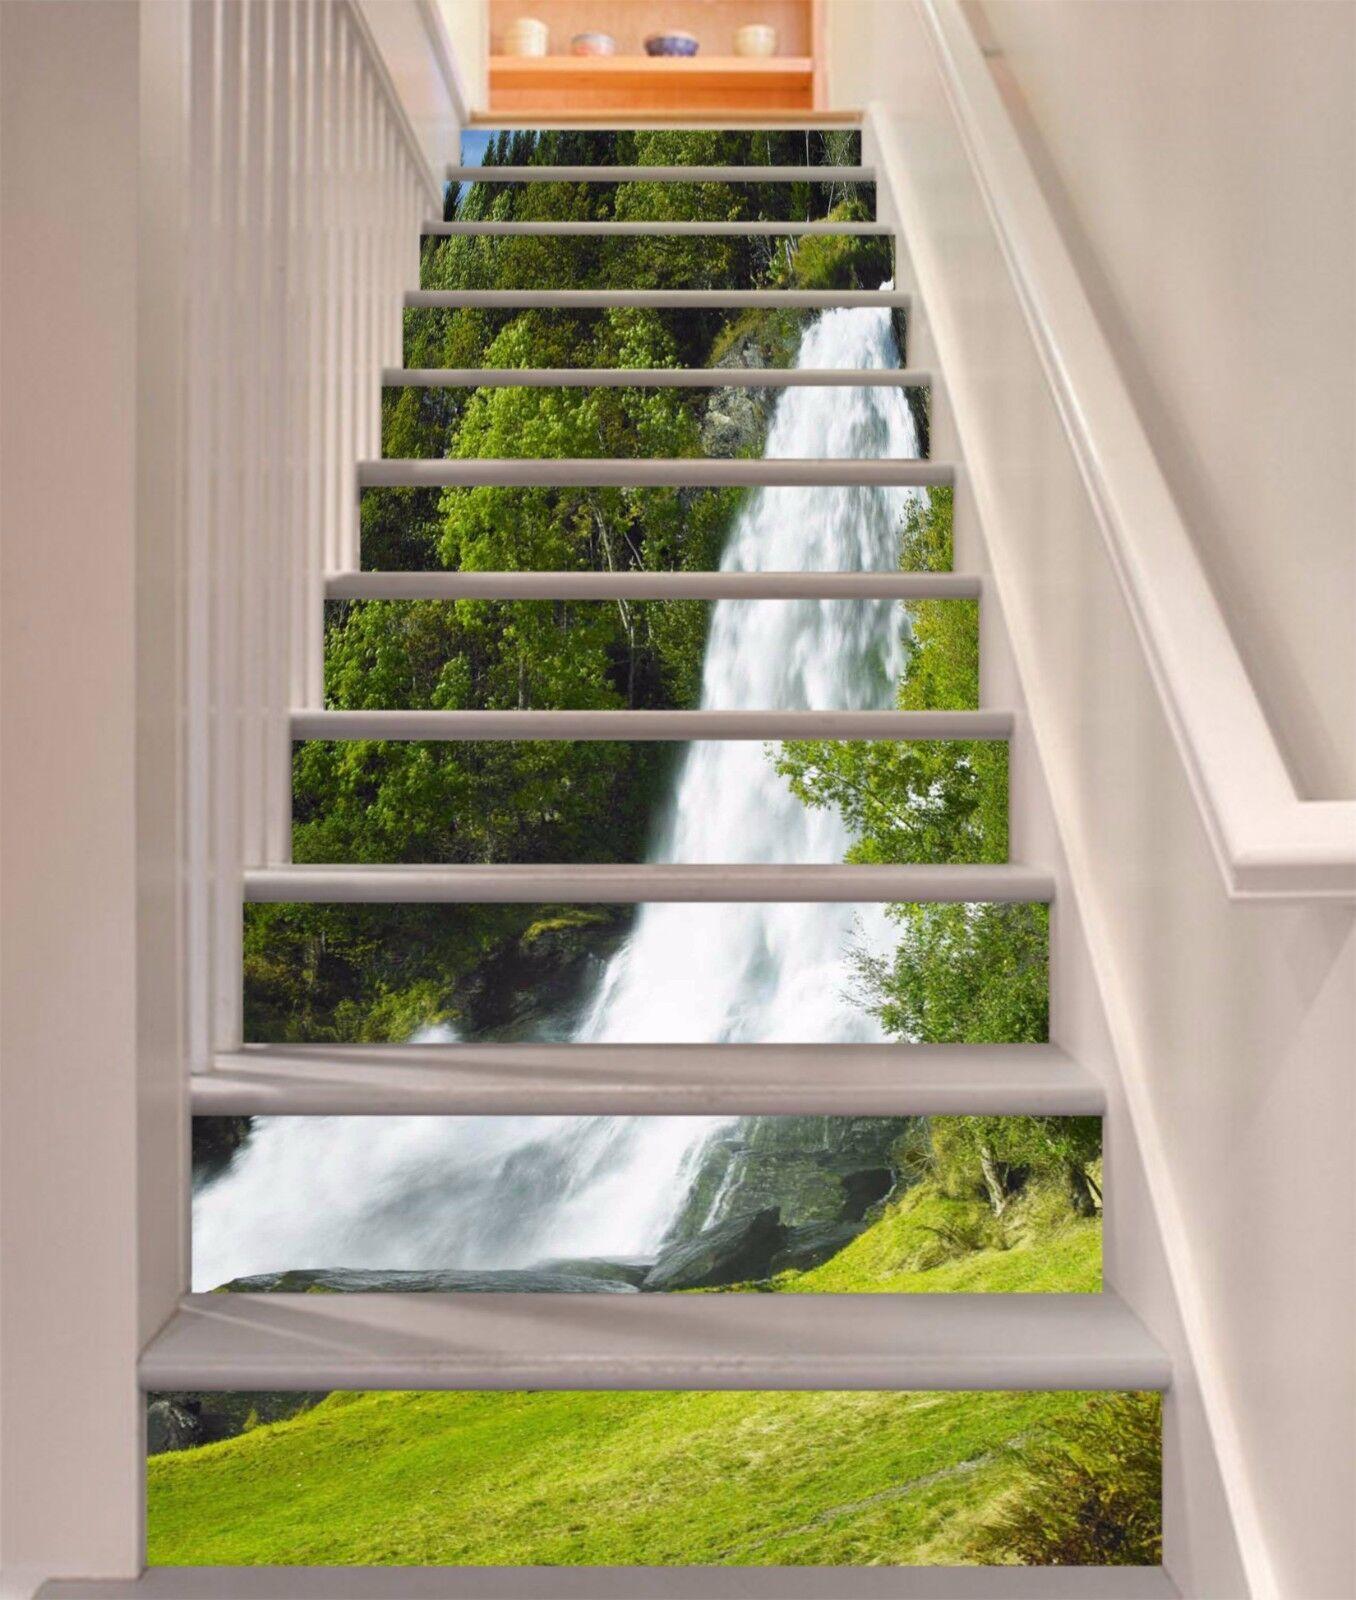 3D Lawn Waterfall 72Stair Risers Decoration Photo Mural Vinyl Decal Wallpaper AU